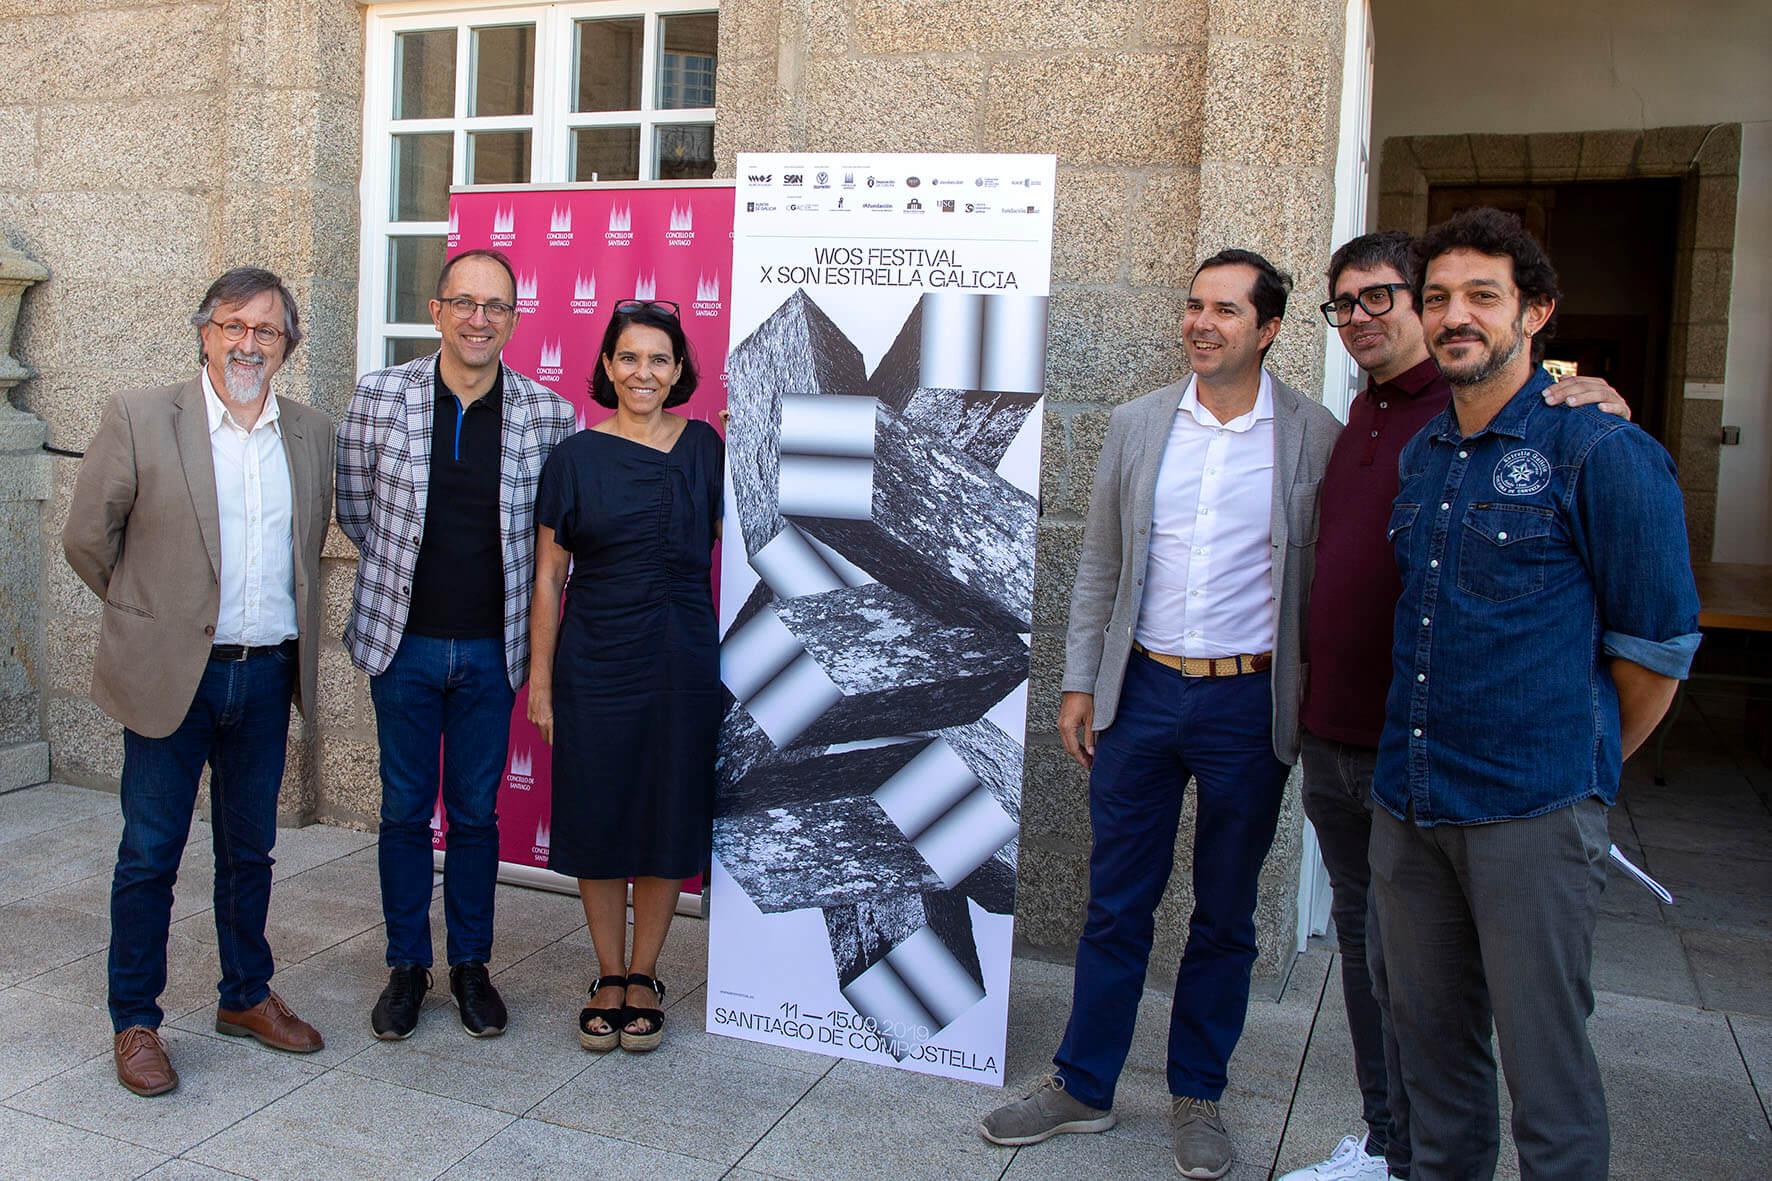 presentacion wos festival 2019 santiago compostela